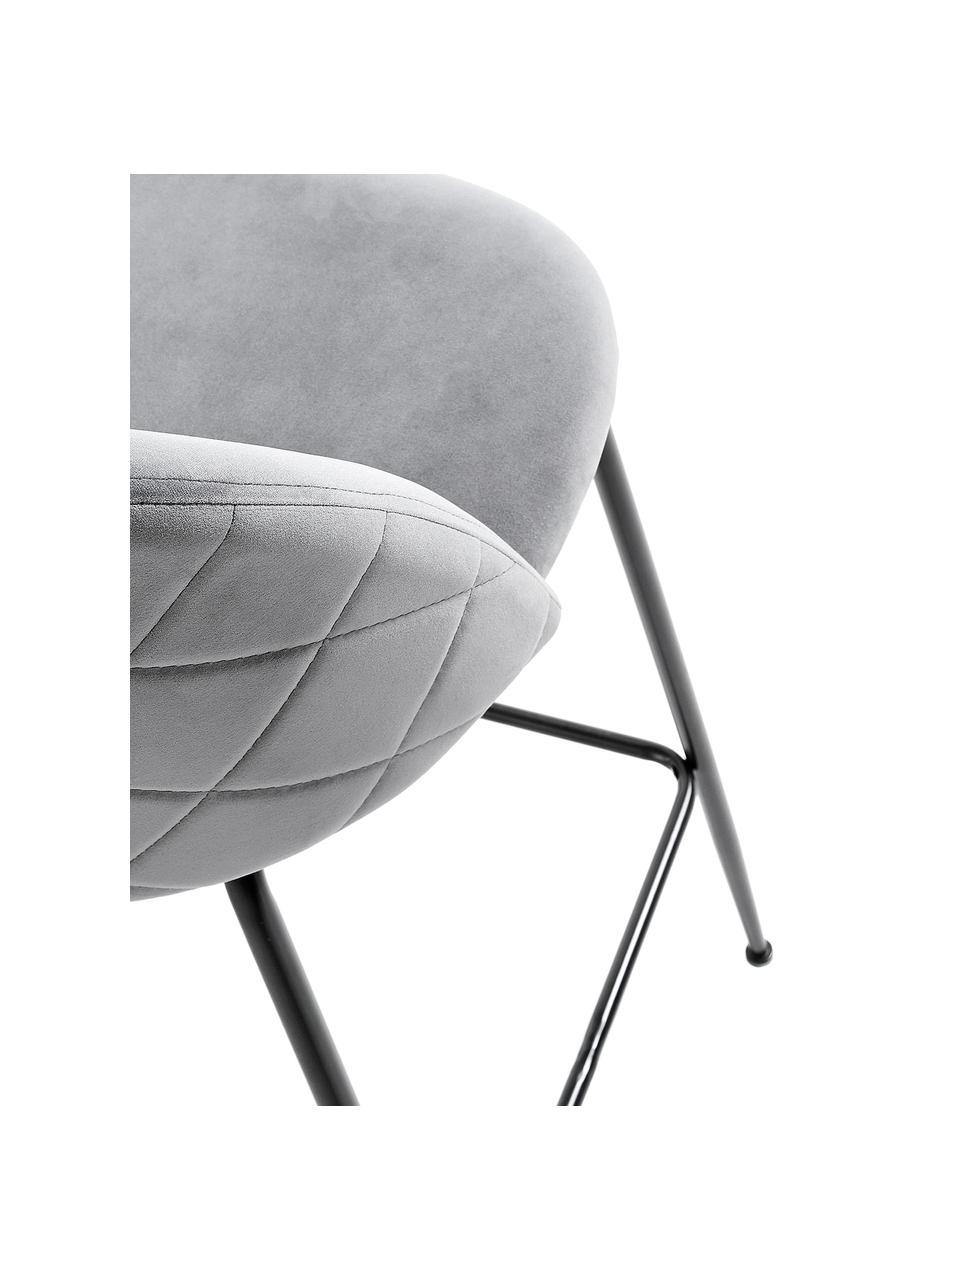 Samt-Barhocker Ivonne in Grau, Bezug: Polyestersamt, Gestell: Metall, lackiert, Grau, Schwarz, 53 x 108 cm